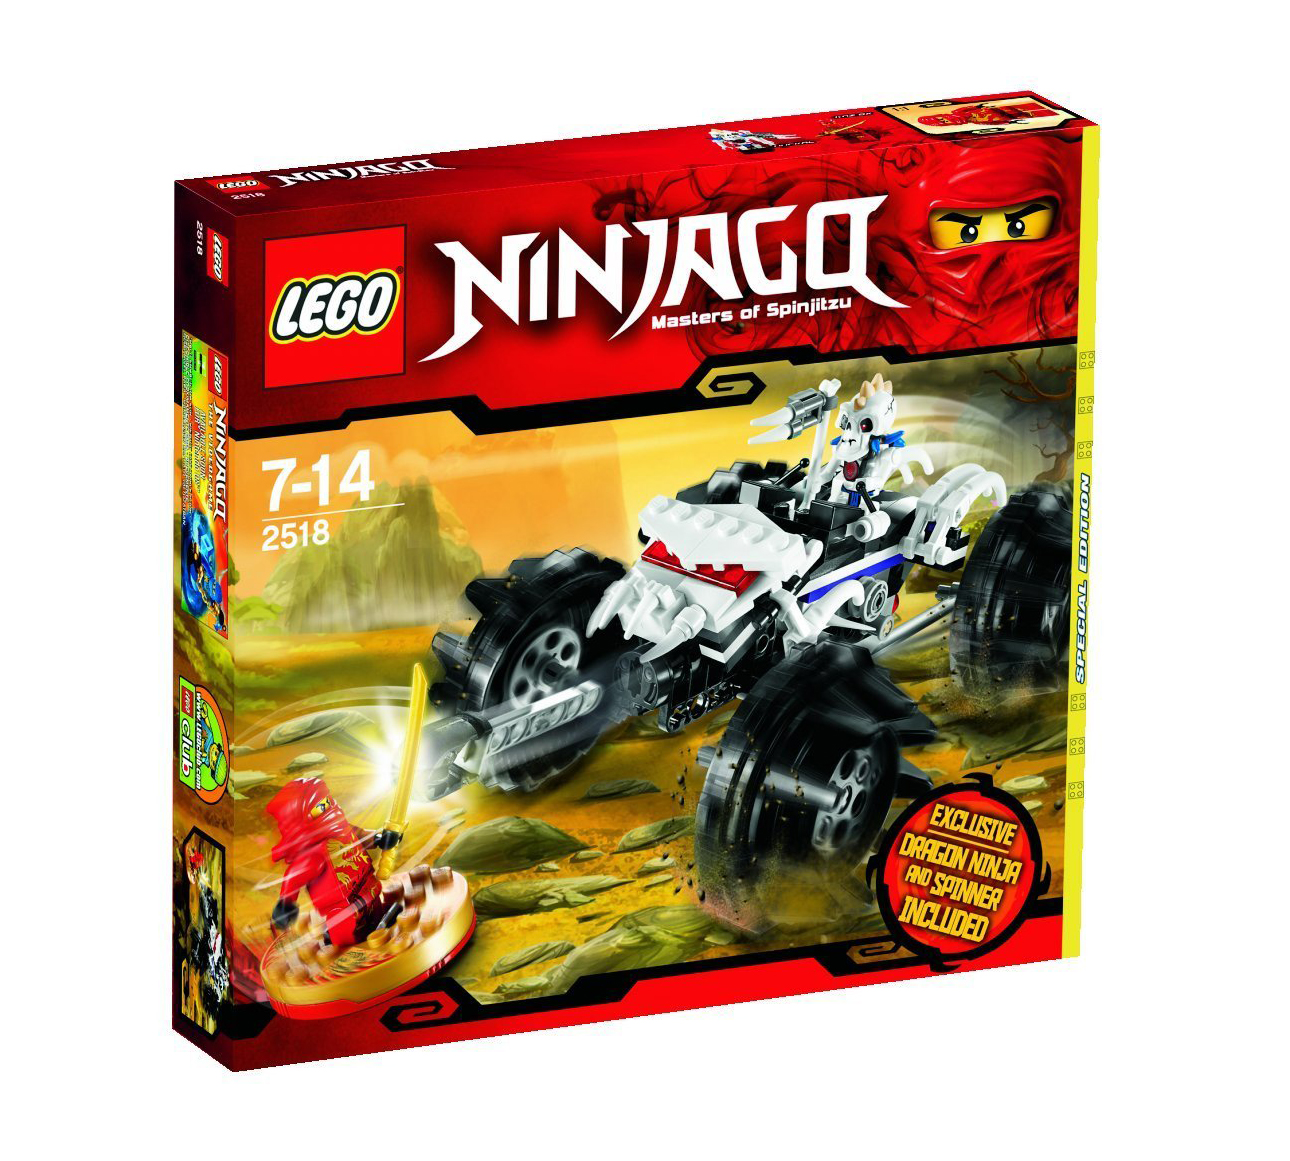 All LEGO Ninjago 2014 Sets